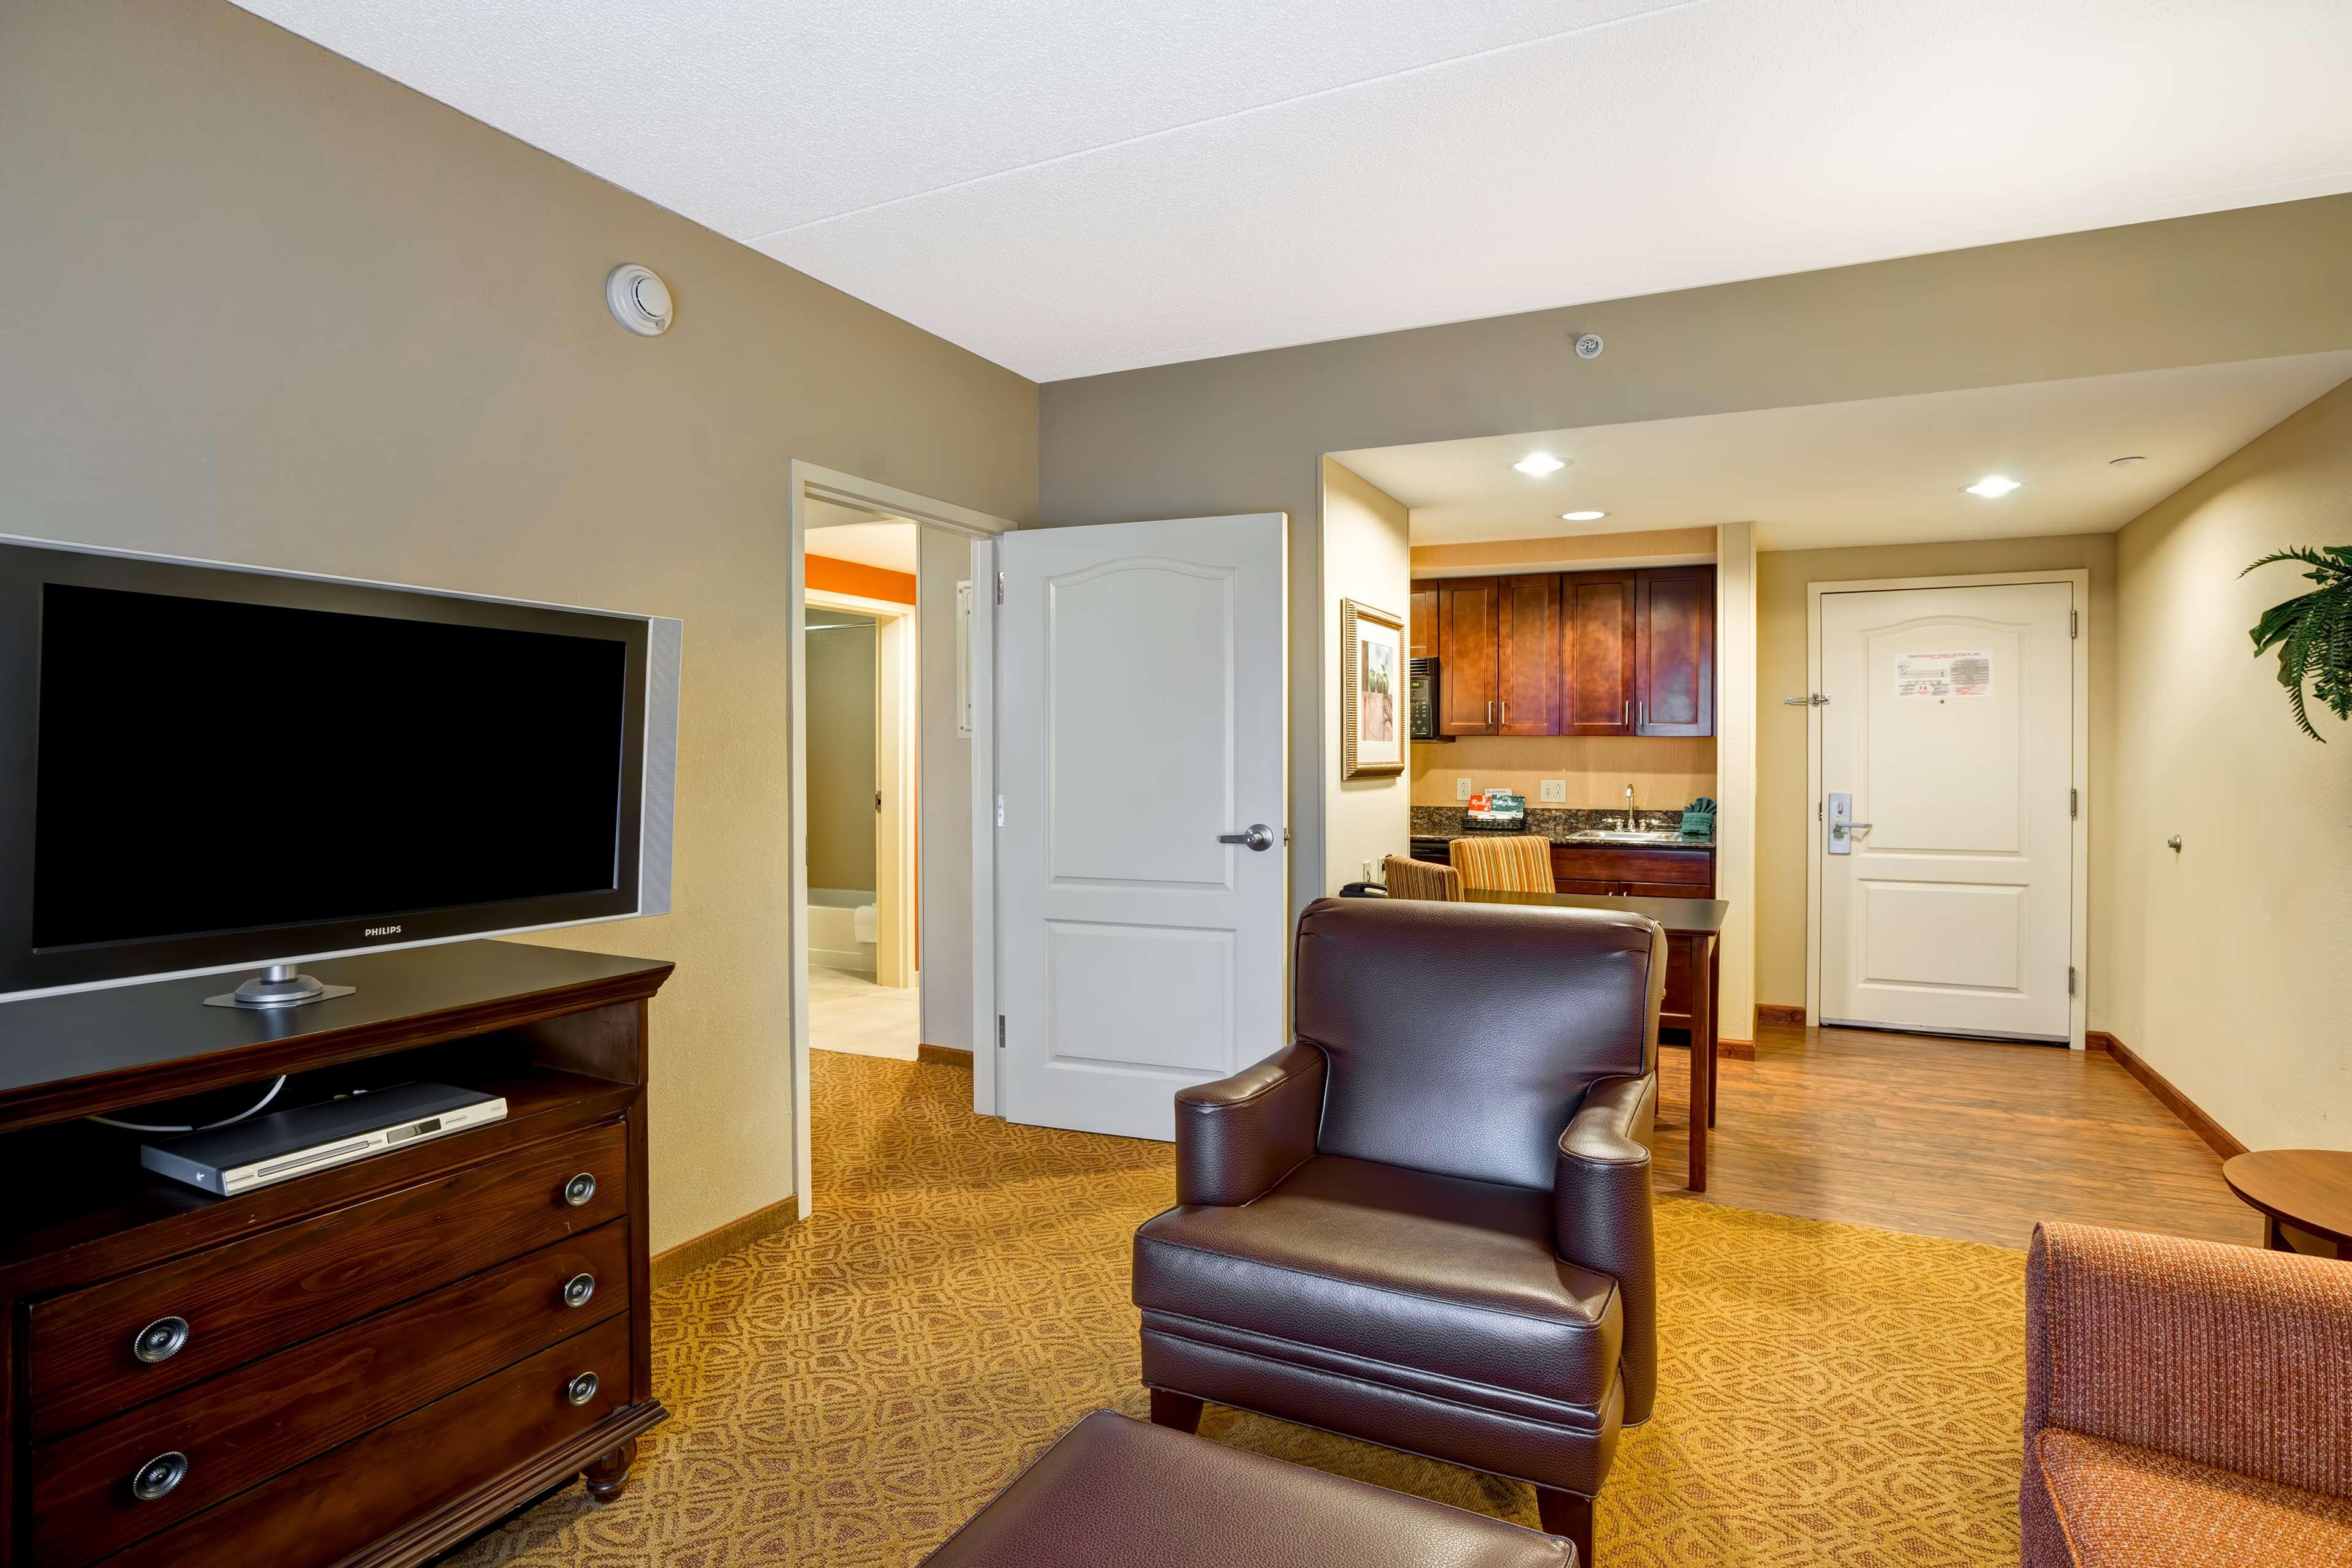 Homewood Suites by Hilton Fredericksburg image 20